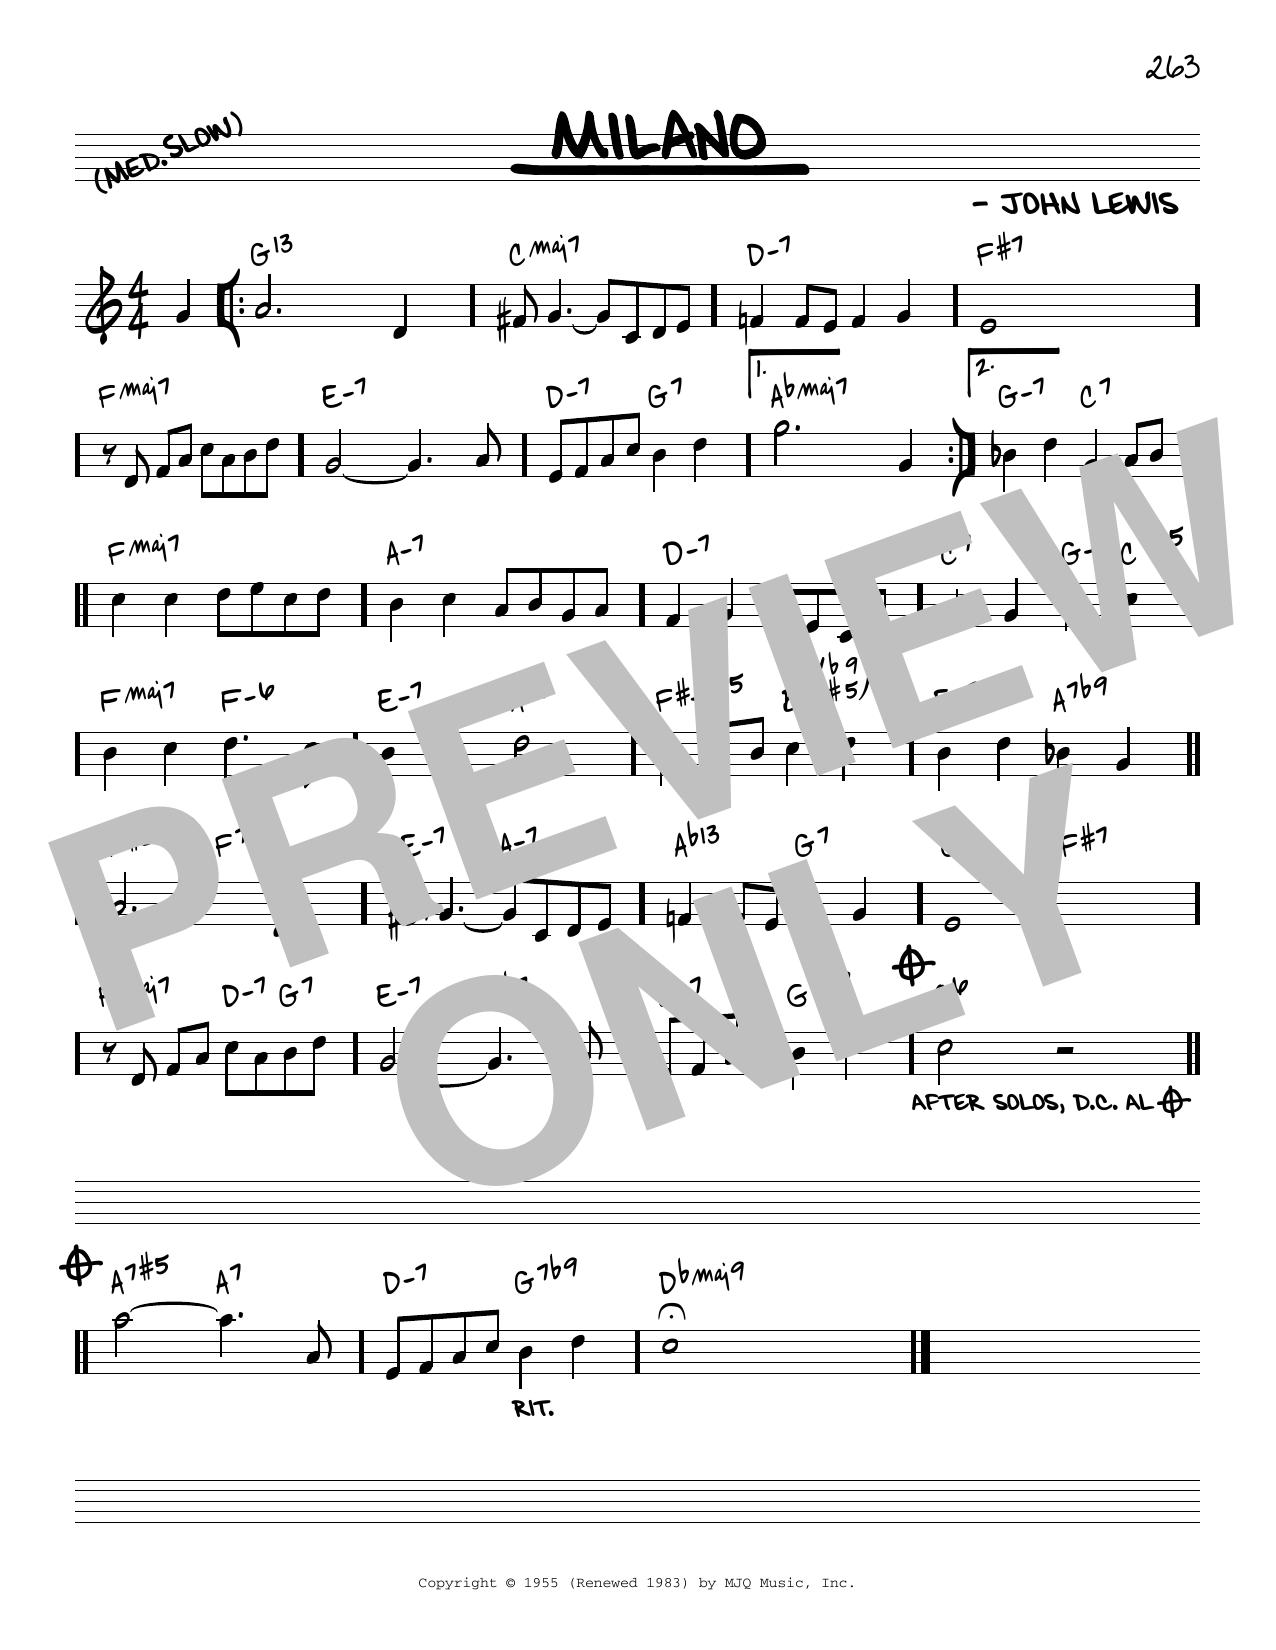 John Lewis Milano [Reharmonized version] (arr. Jack Grassel) sheet music notes printable PDF score